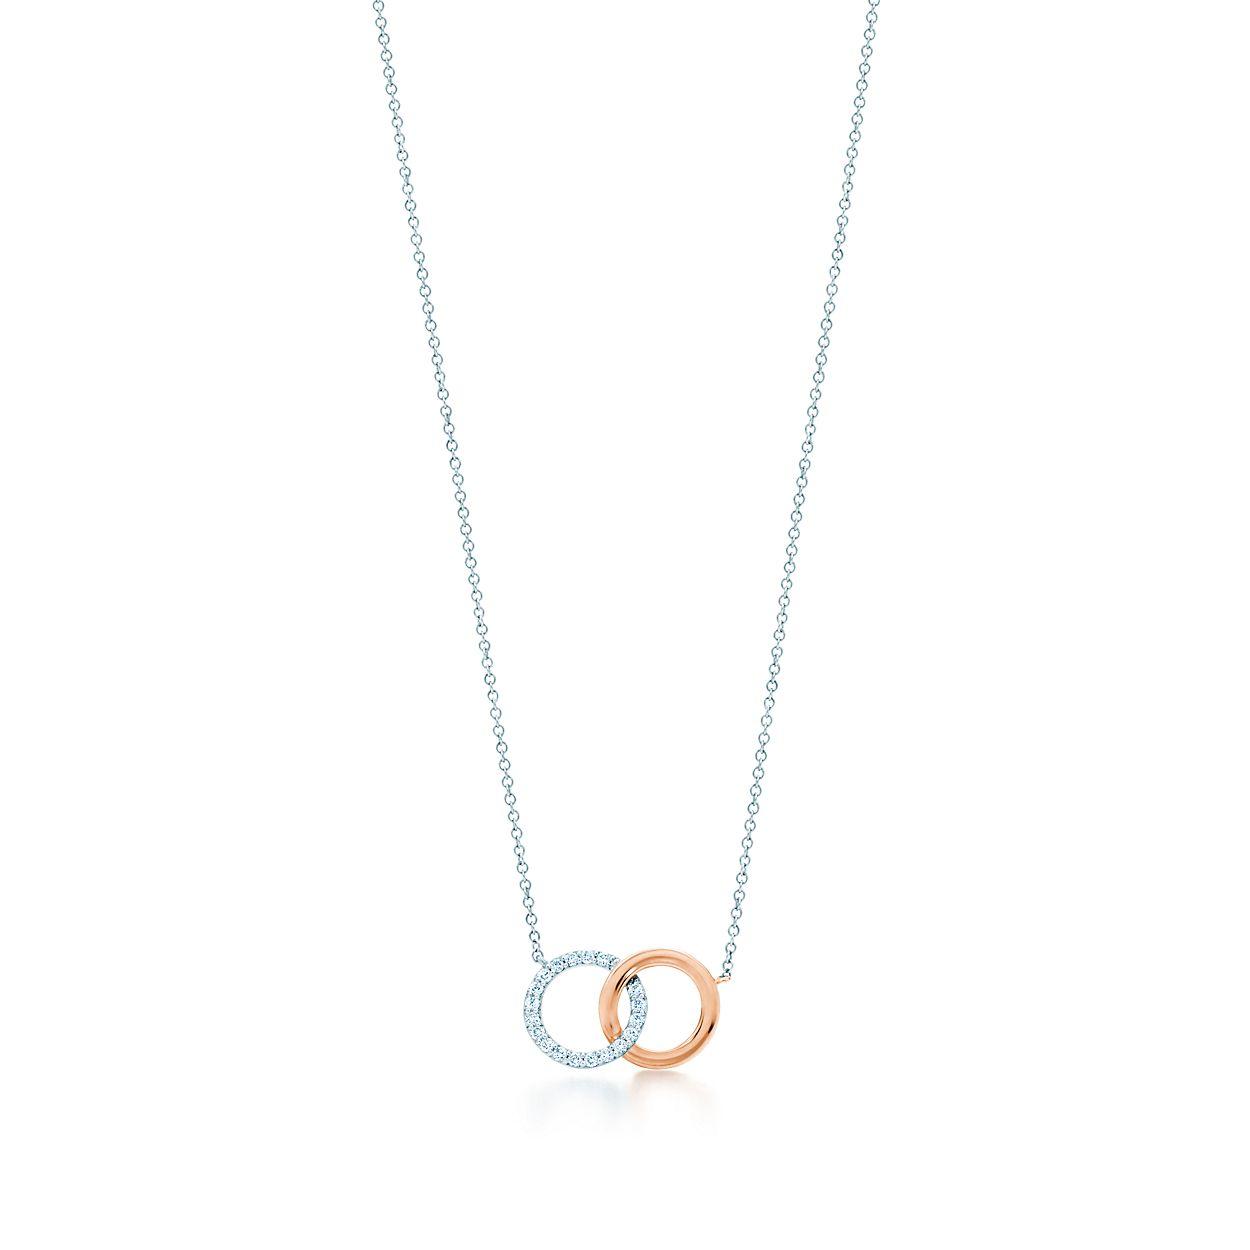 Tiffany 1837 interlocking circles pendant in white and rose gold tiffany 1837double interlocking circles pendant mozeypictures Gallery